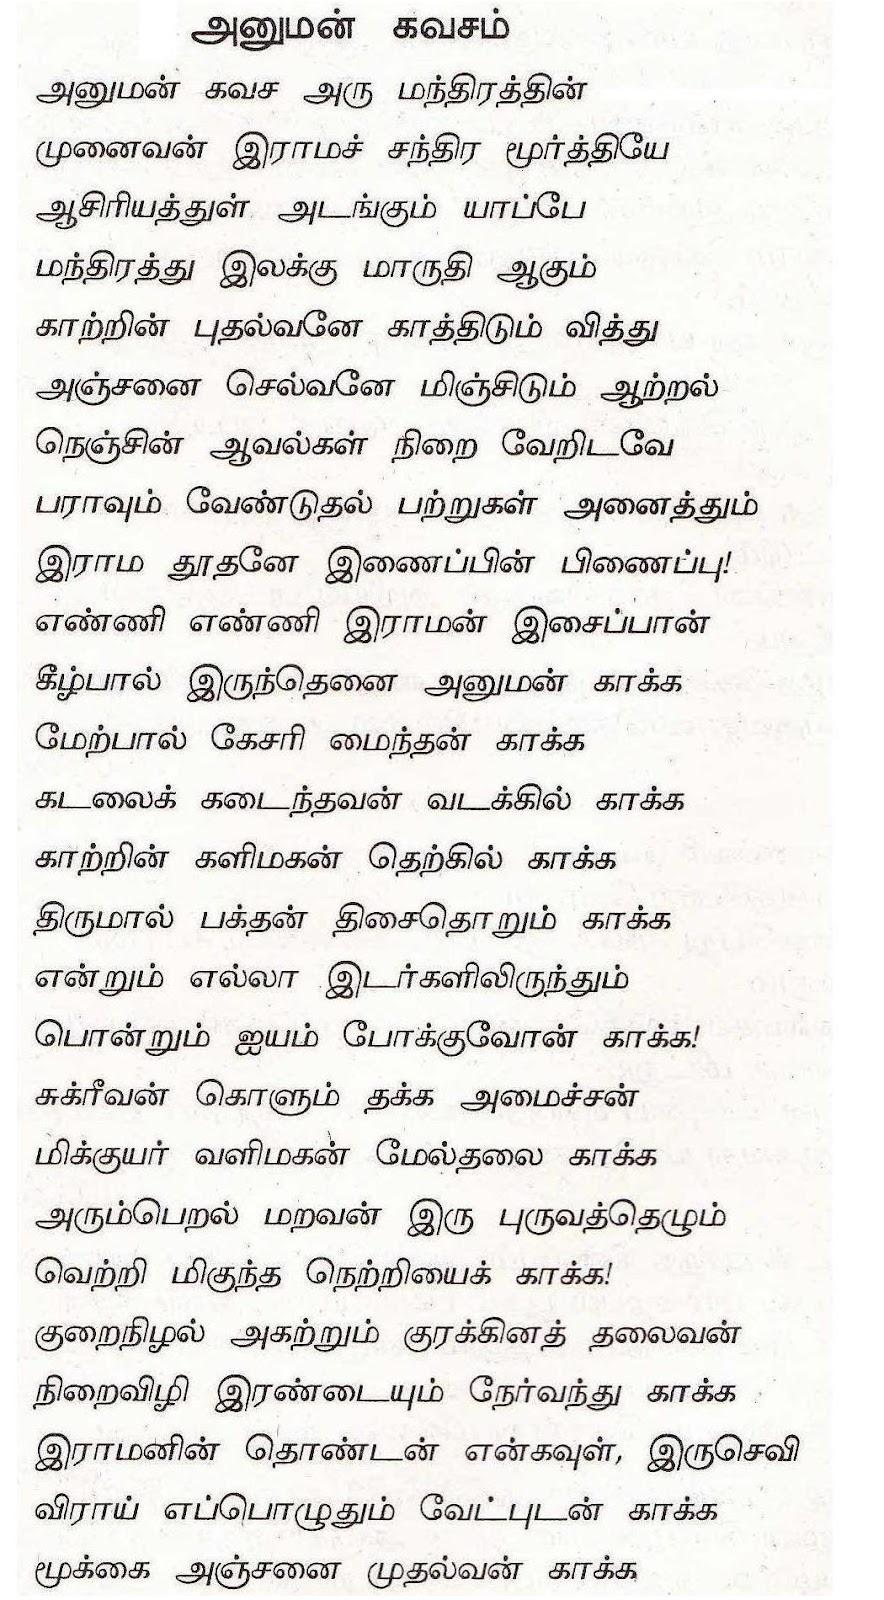 Ayyappa Kavacham Lyrics in Tamil - templesinindiainfo.com